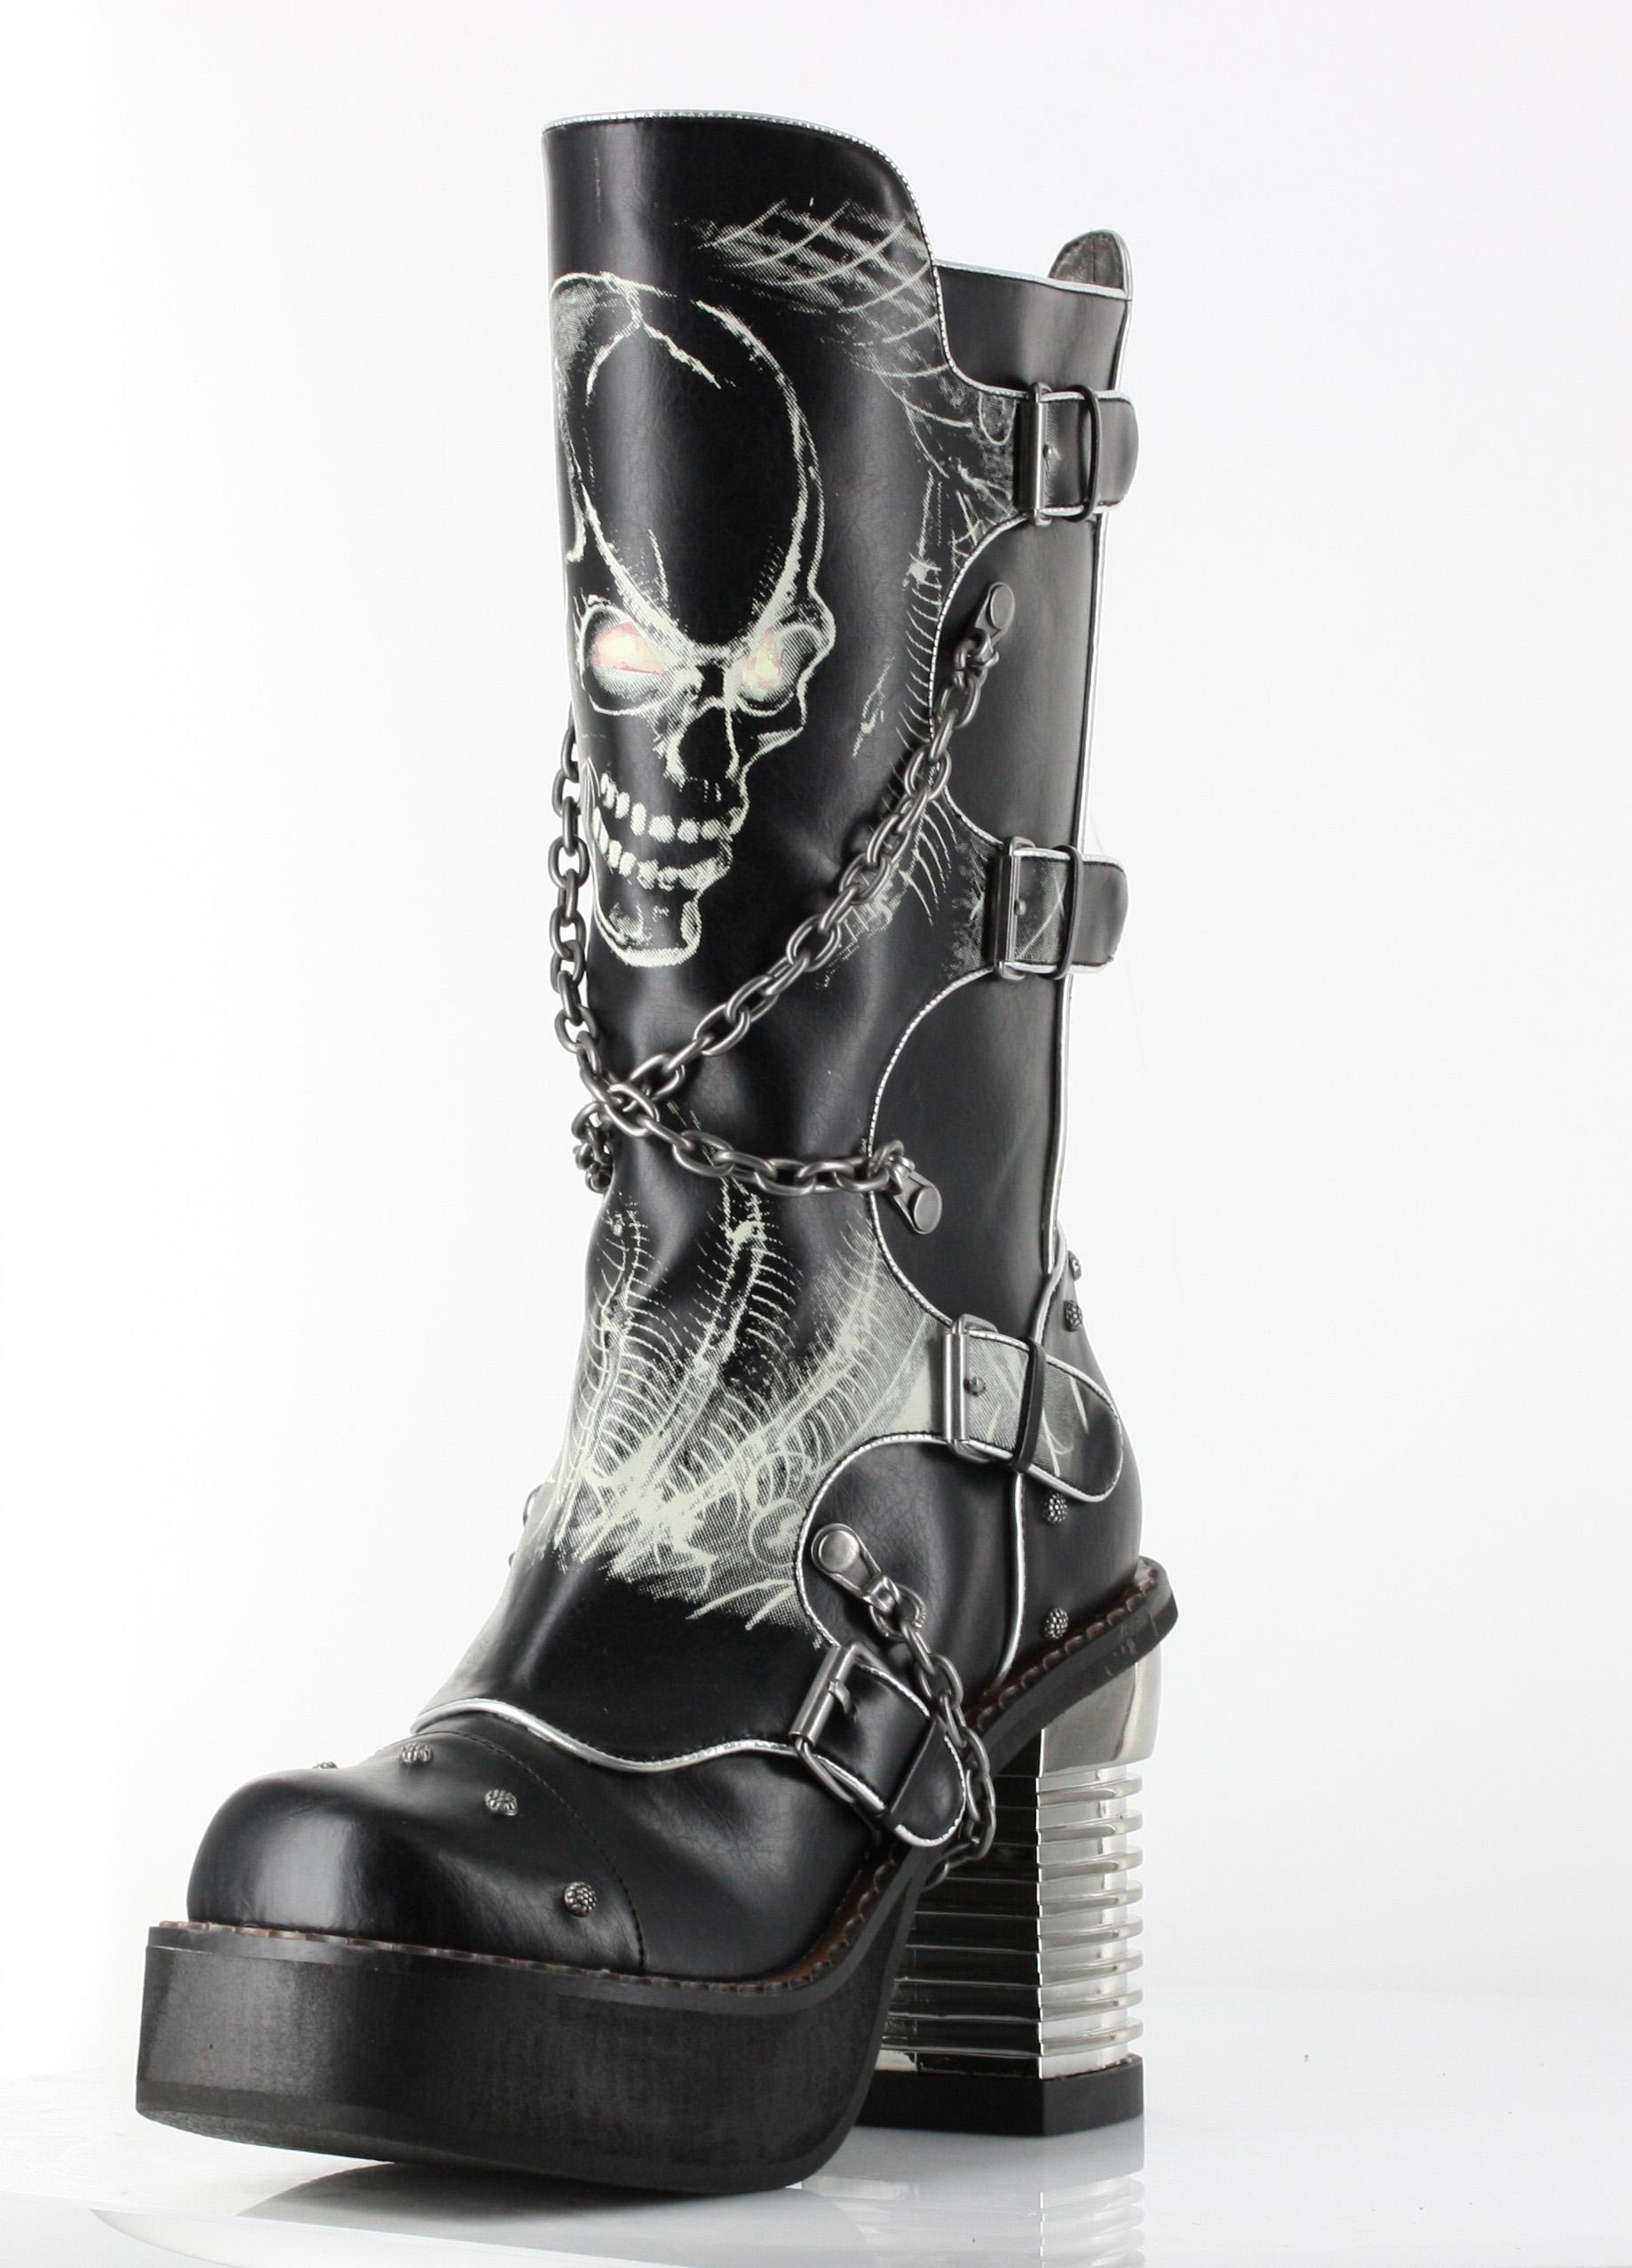 Skull biker goth platform goth boots 9 to ship boots 6 jpg 1464142690